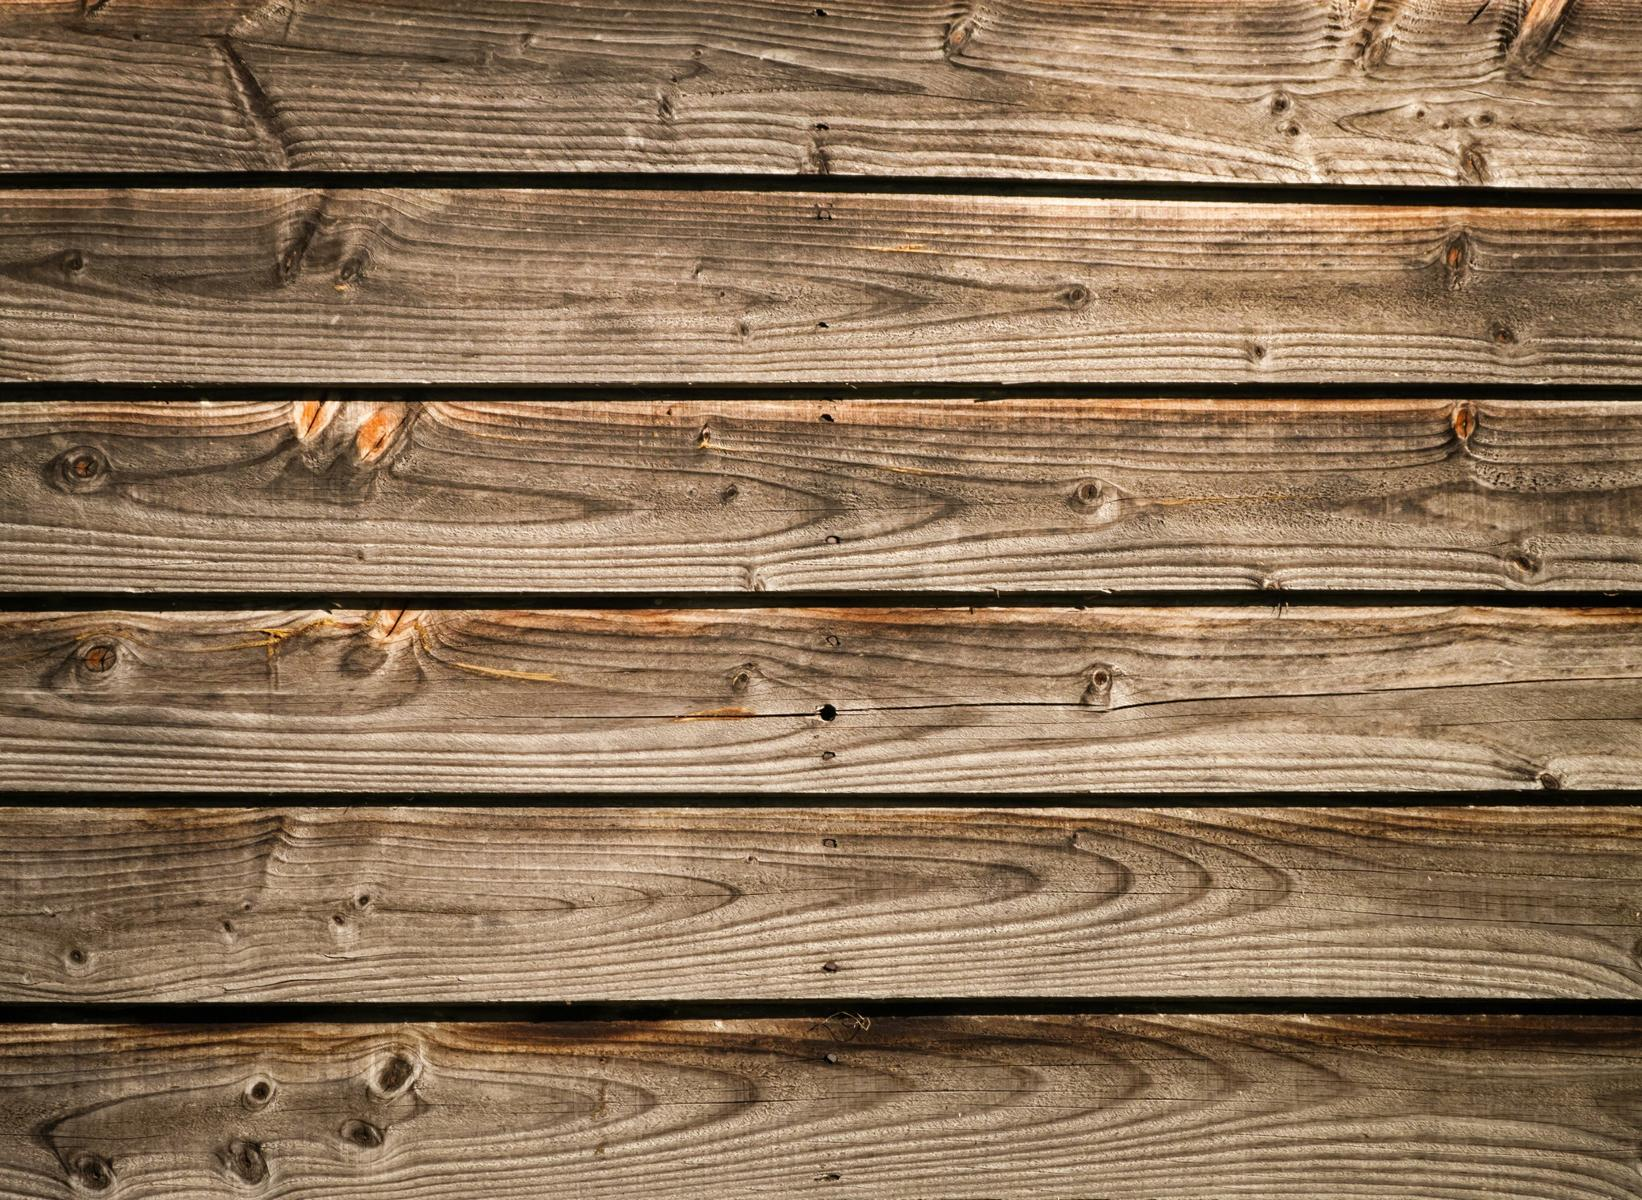 Barn Board Wallpaper - WallpaperSafari